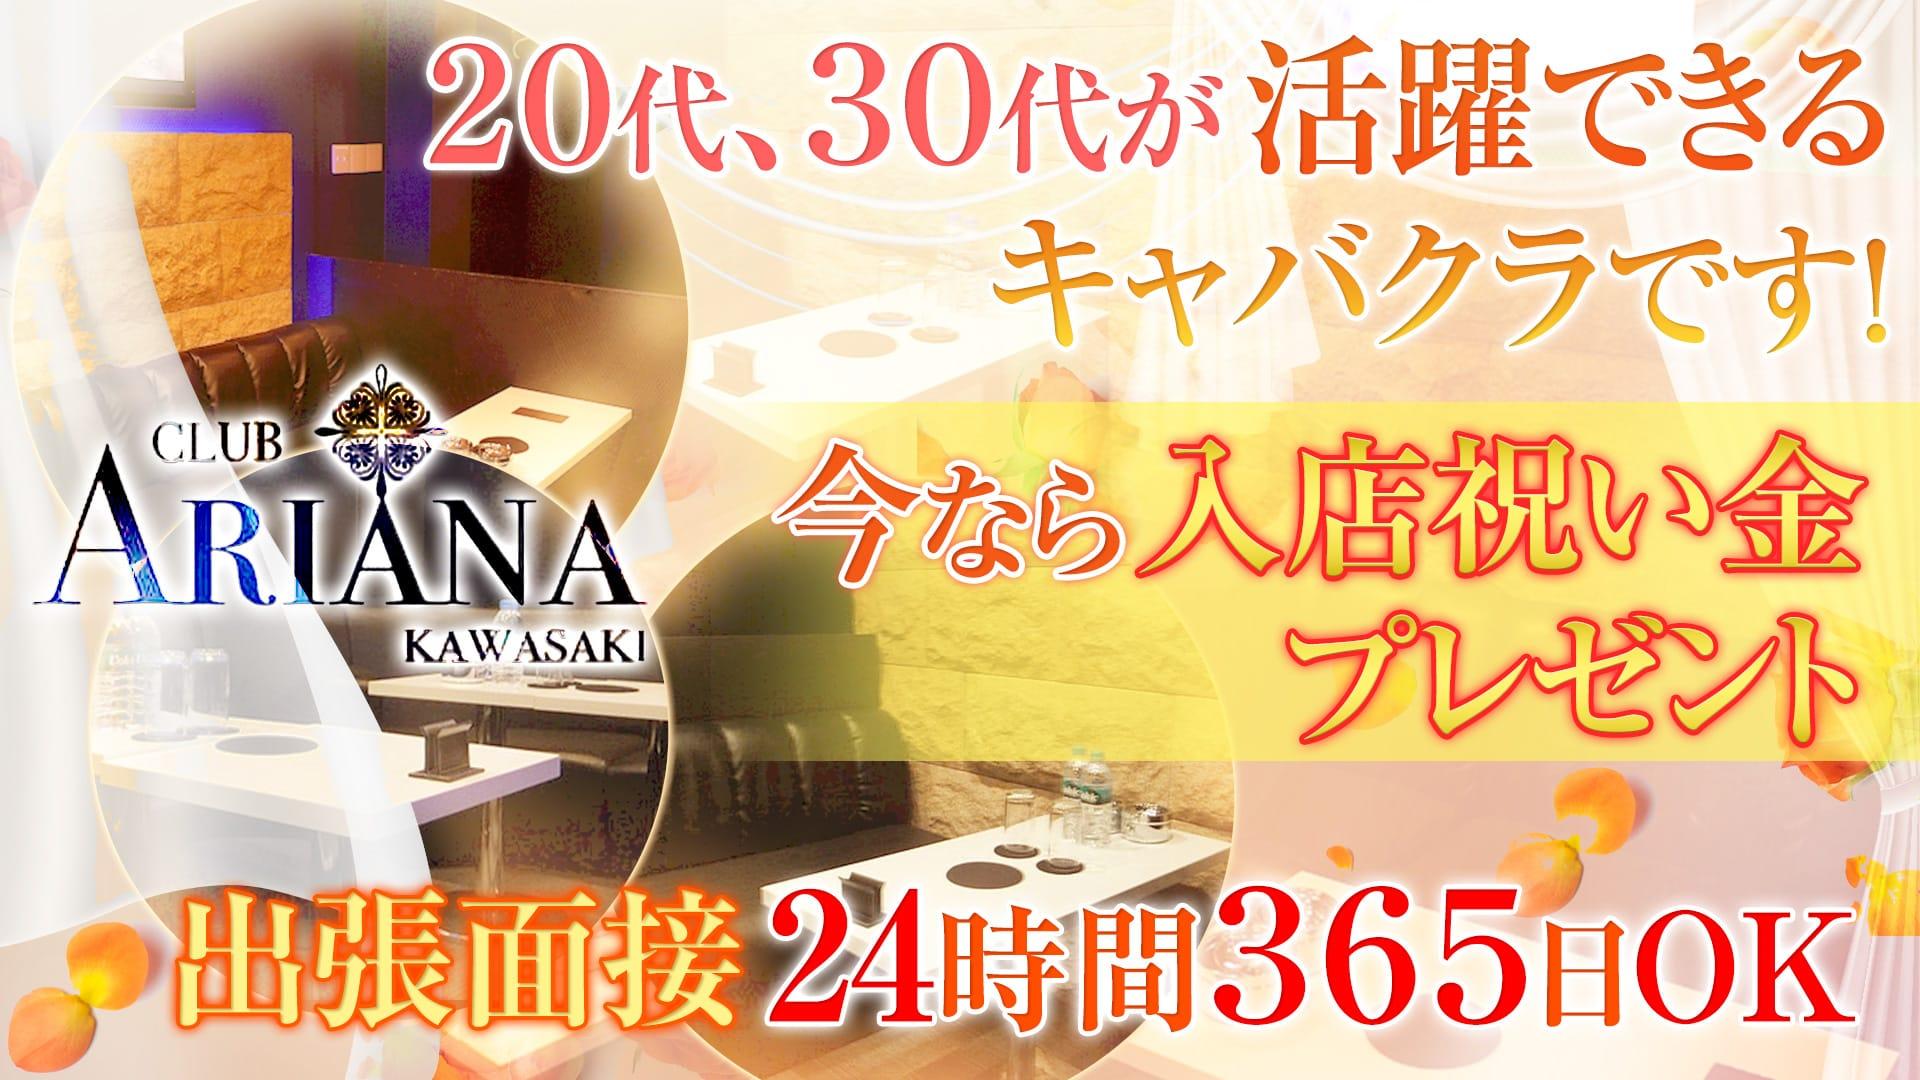 CLUB ARIANA(アリアナ) 川崎昼キャバ・朝キャバ TOP画像